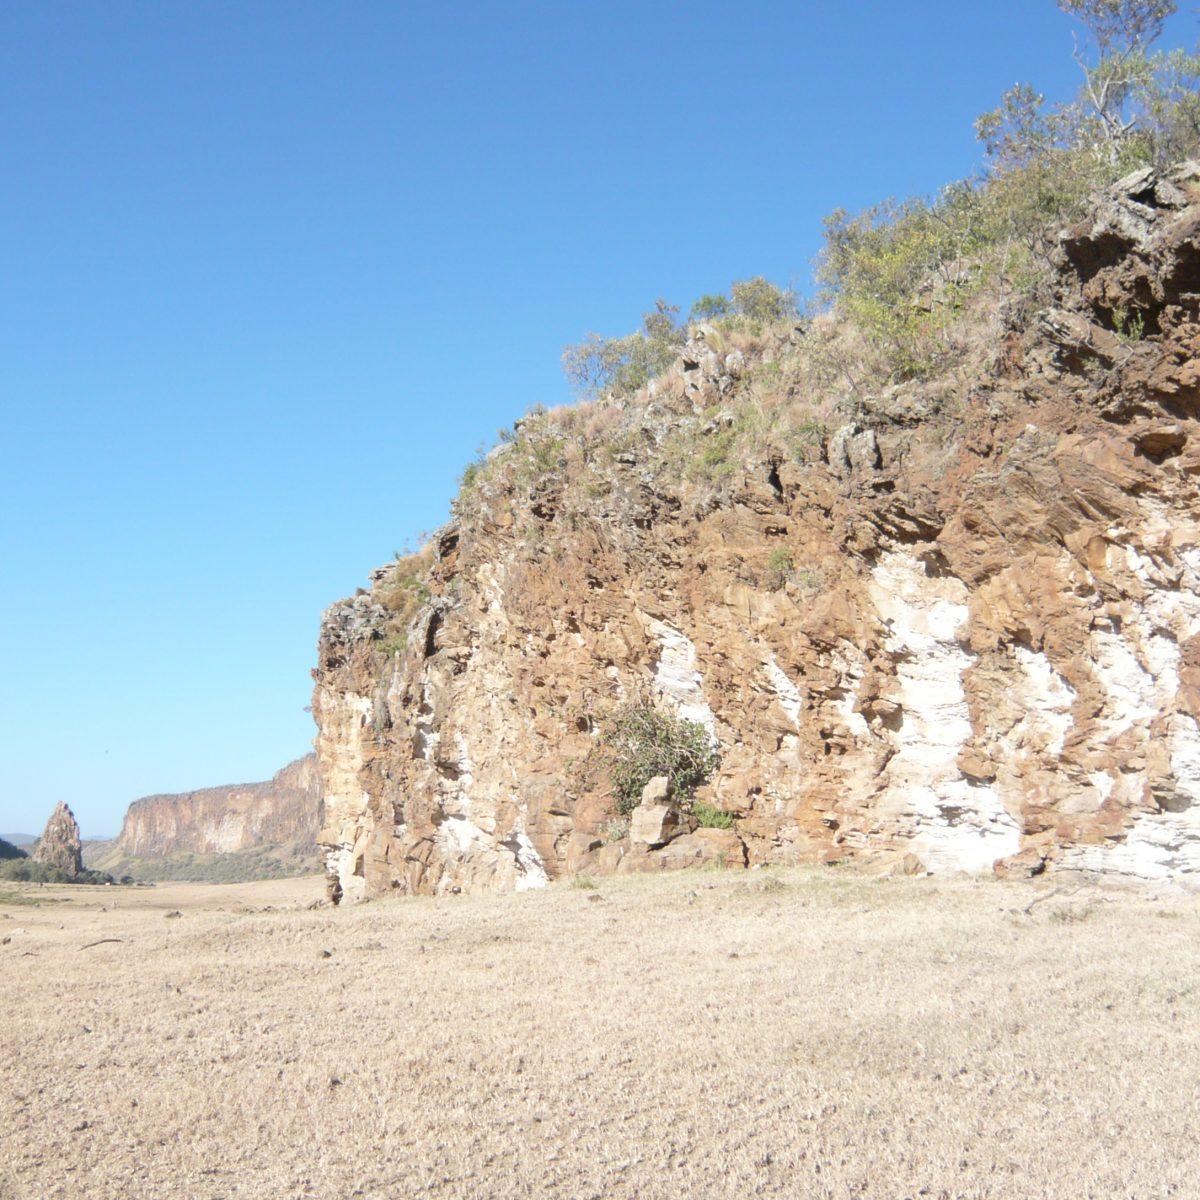 Hells Gate Nationalpark Kenia.....ja wegen der HITZE